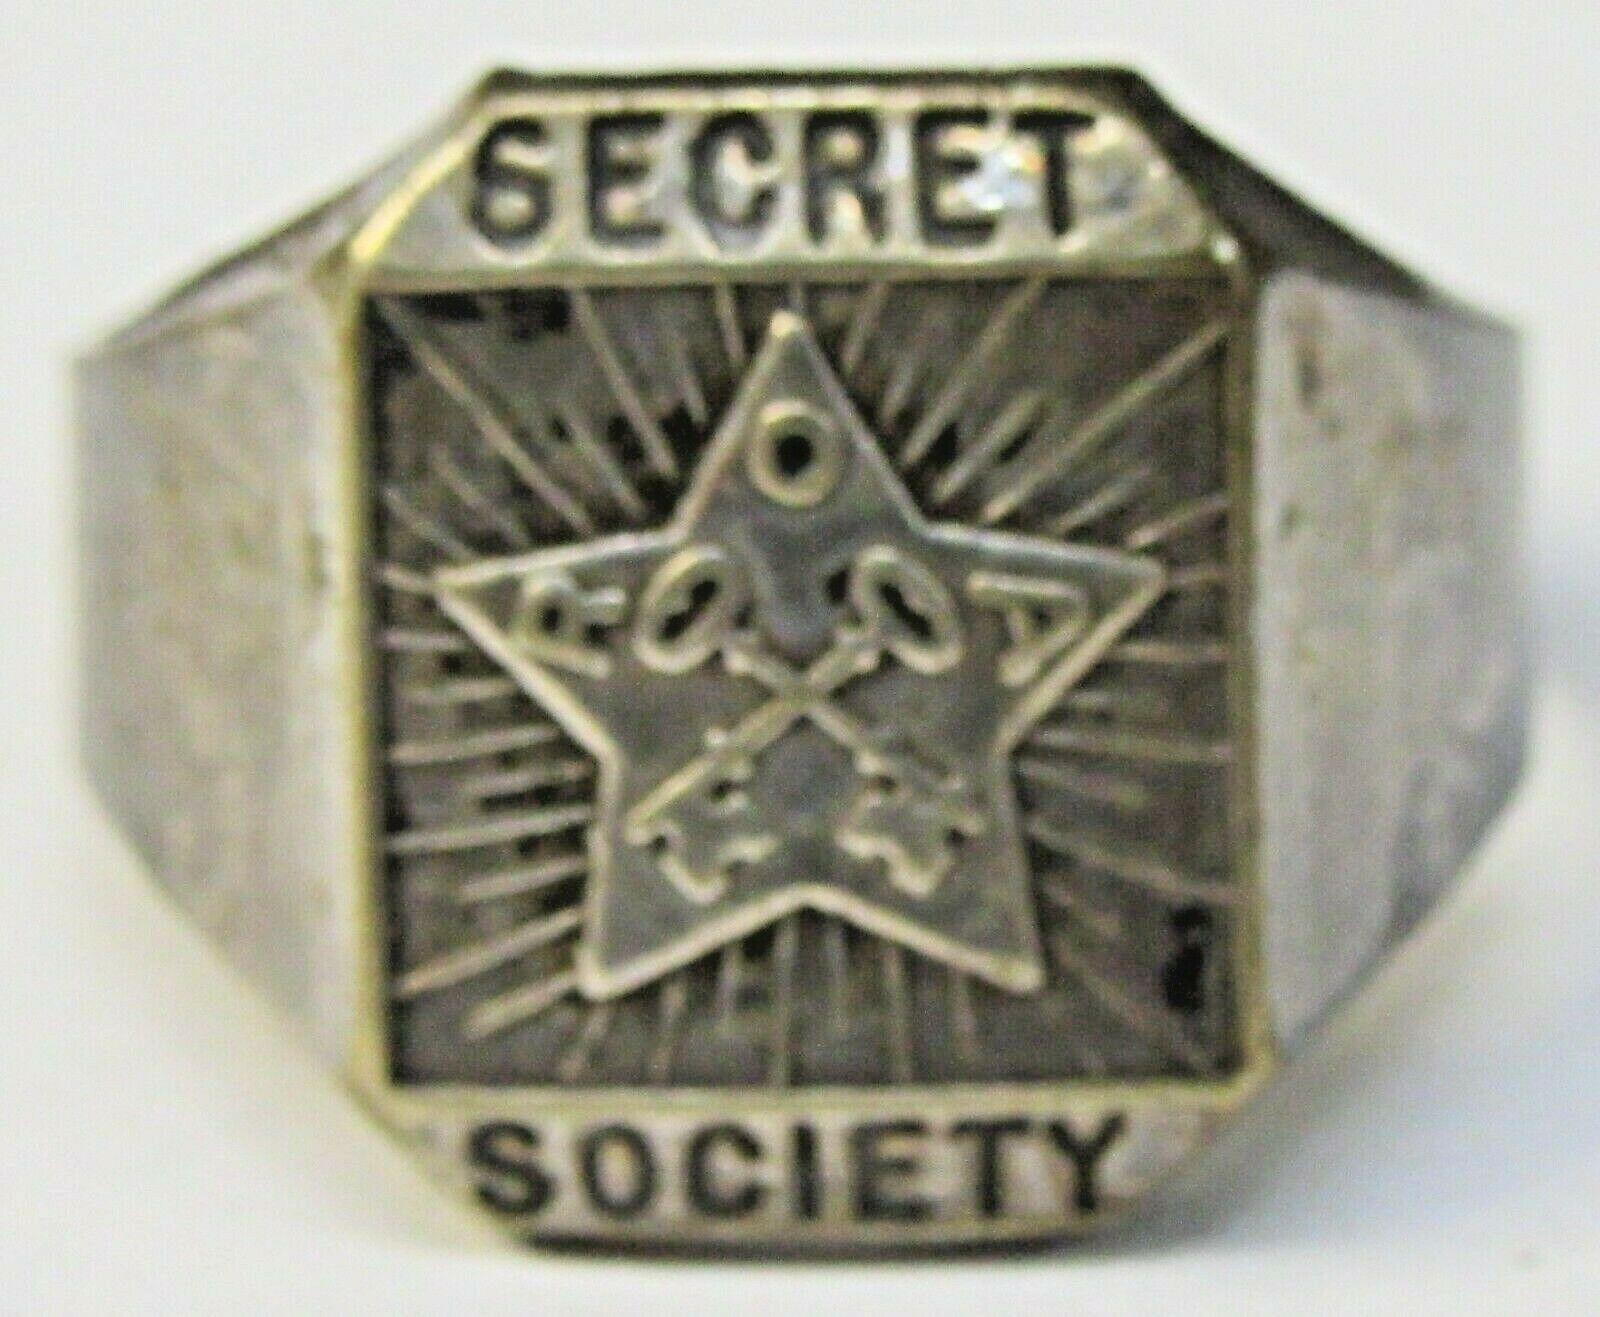 1936 ORPHAN ANNIE SECRET SOCIETY Silver Star Ring Ovaltine Radio Premium f1